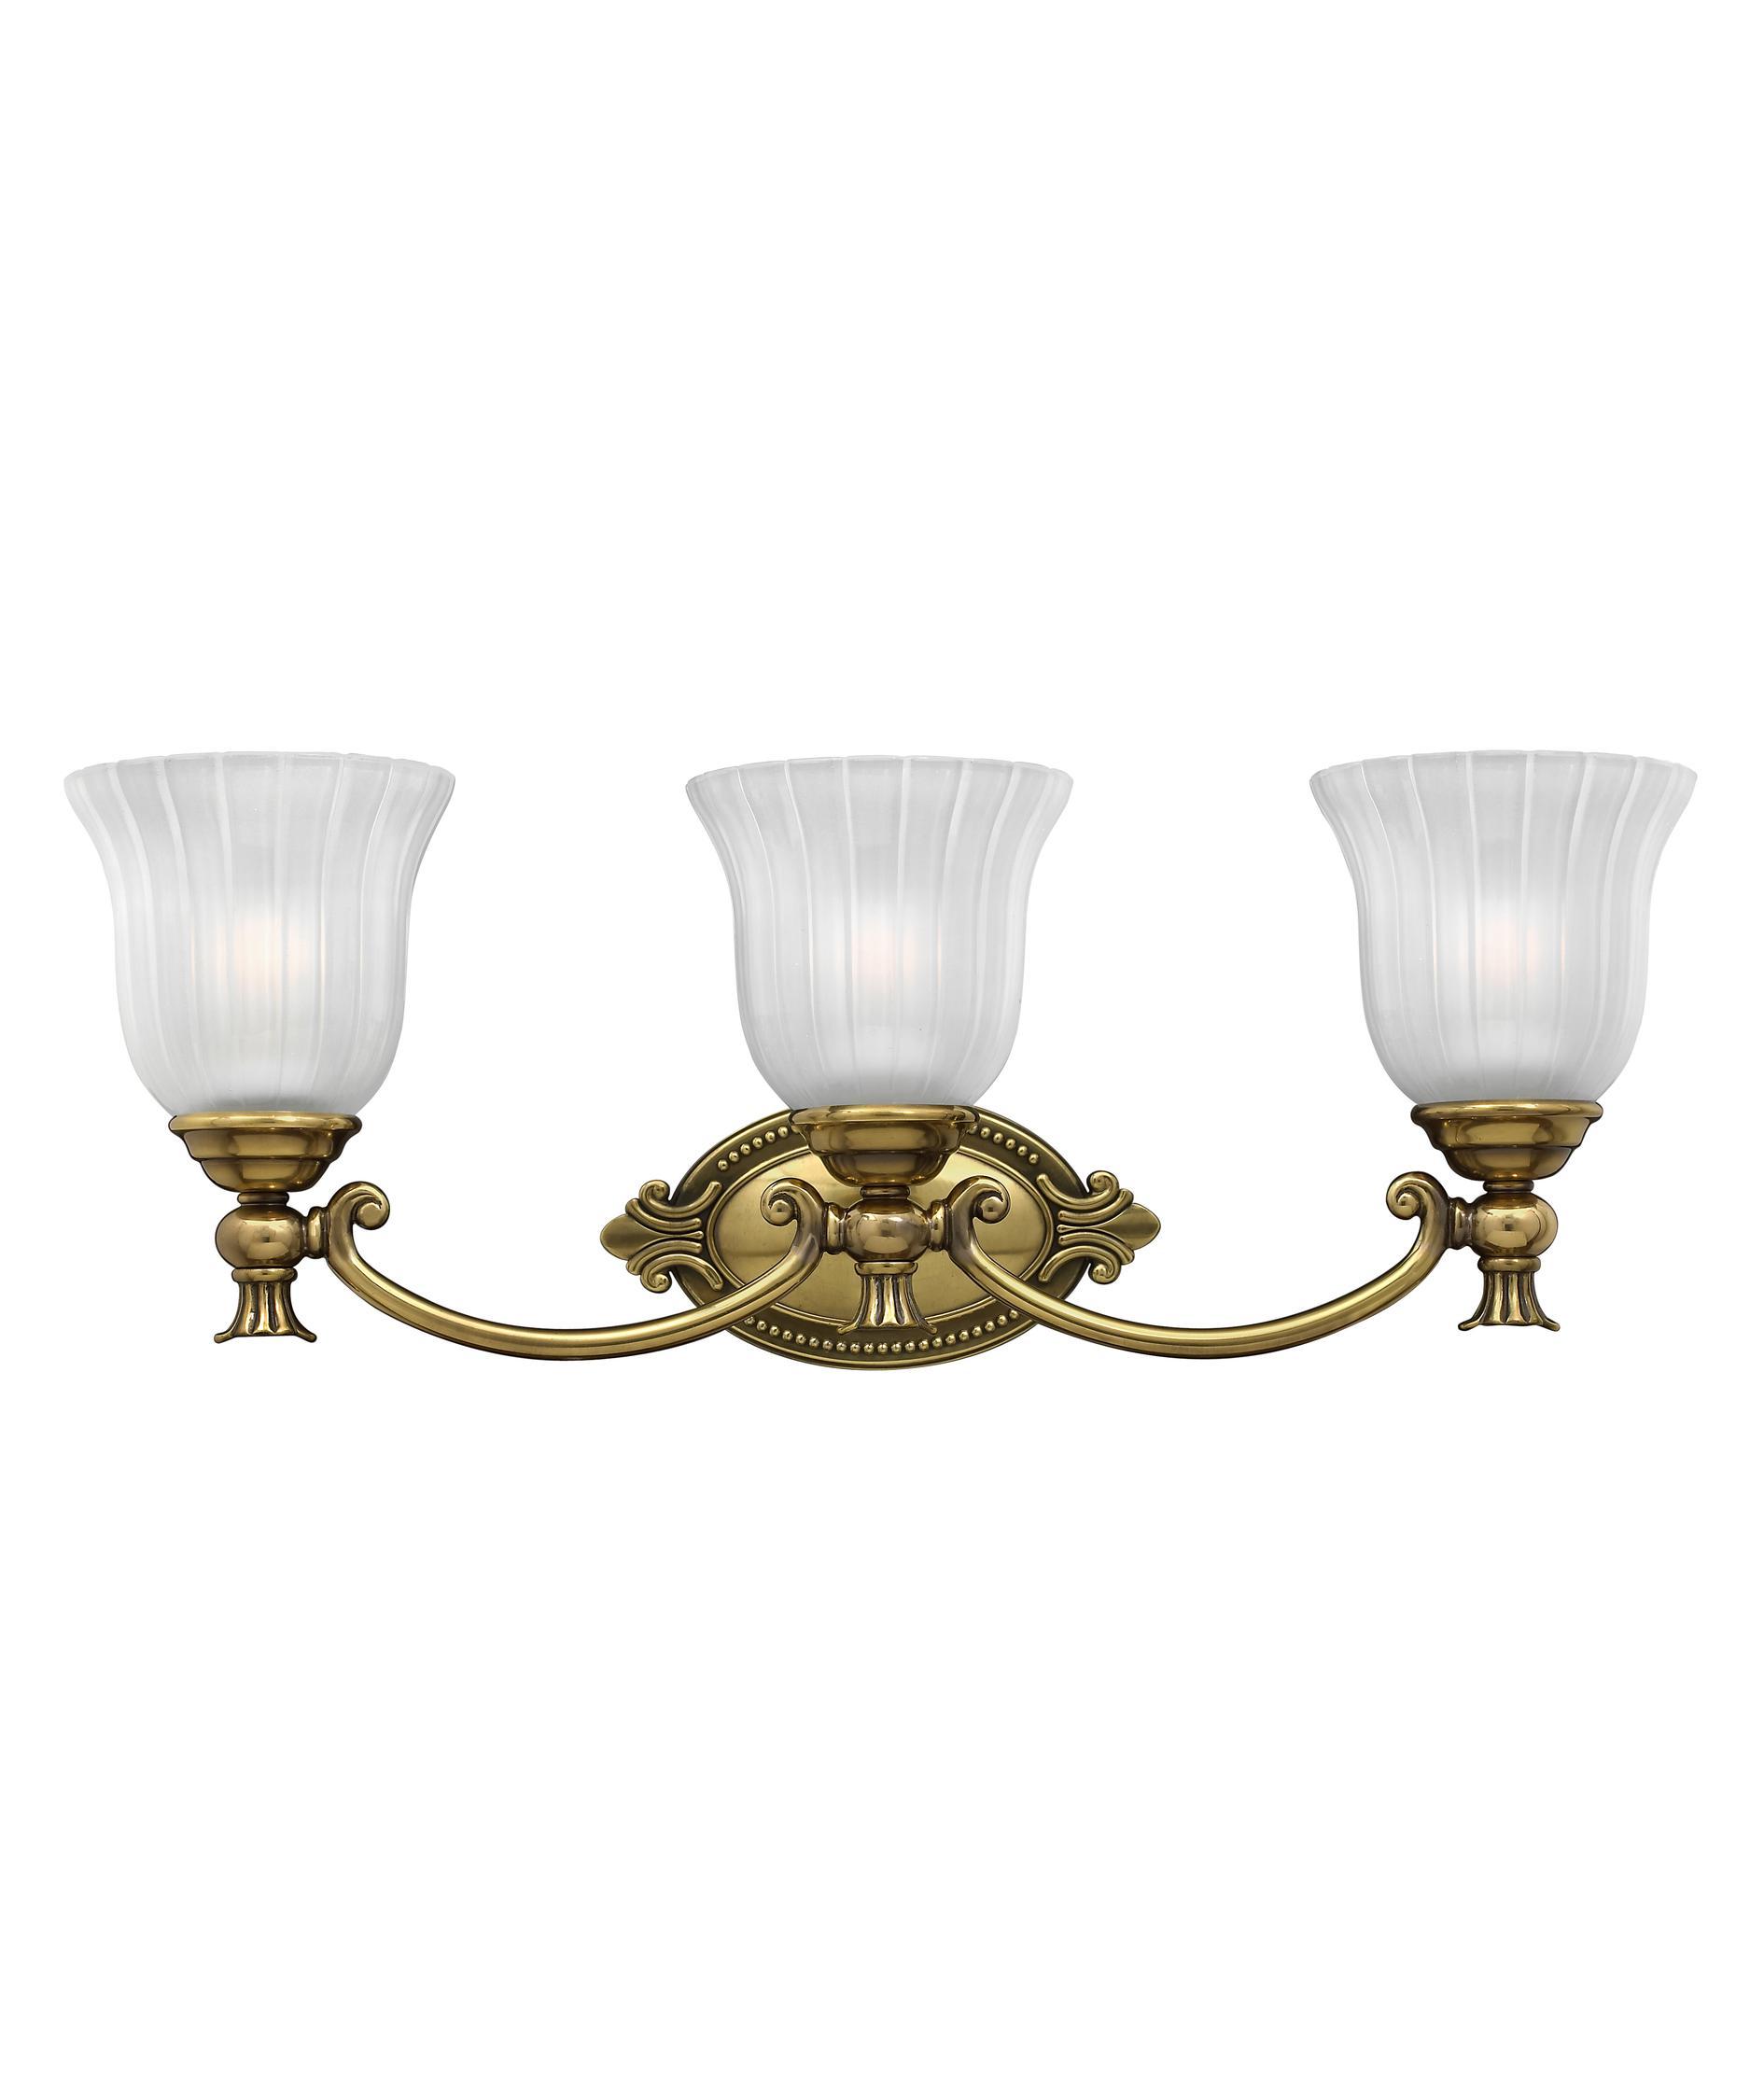 Hinkley Lighting 5583 Francoise 25 Inch Wide Bath Vanity Light